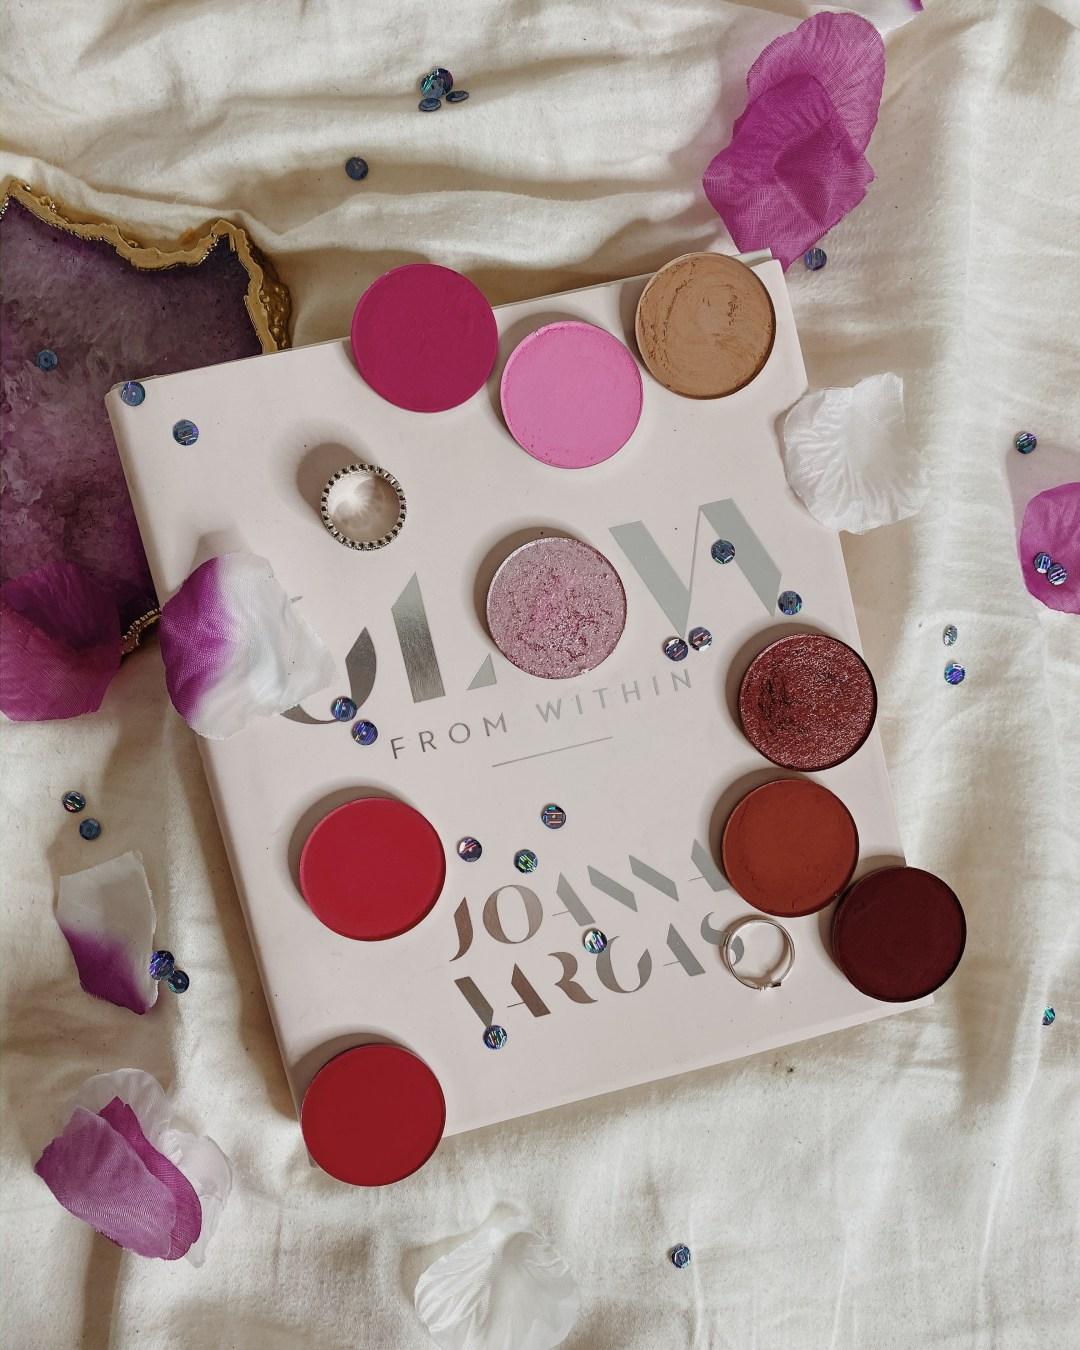 Indie Beauty Single Eyeshadow Collection Ranking | Give Me Glow Cosmetics Single Eyeshadows